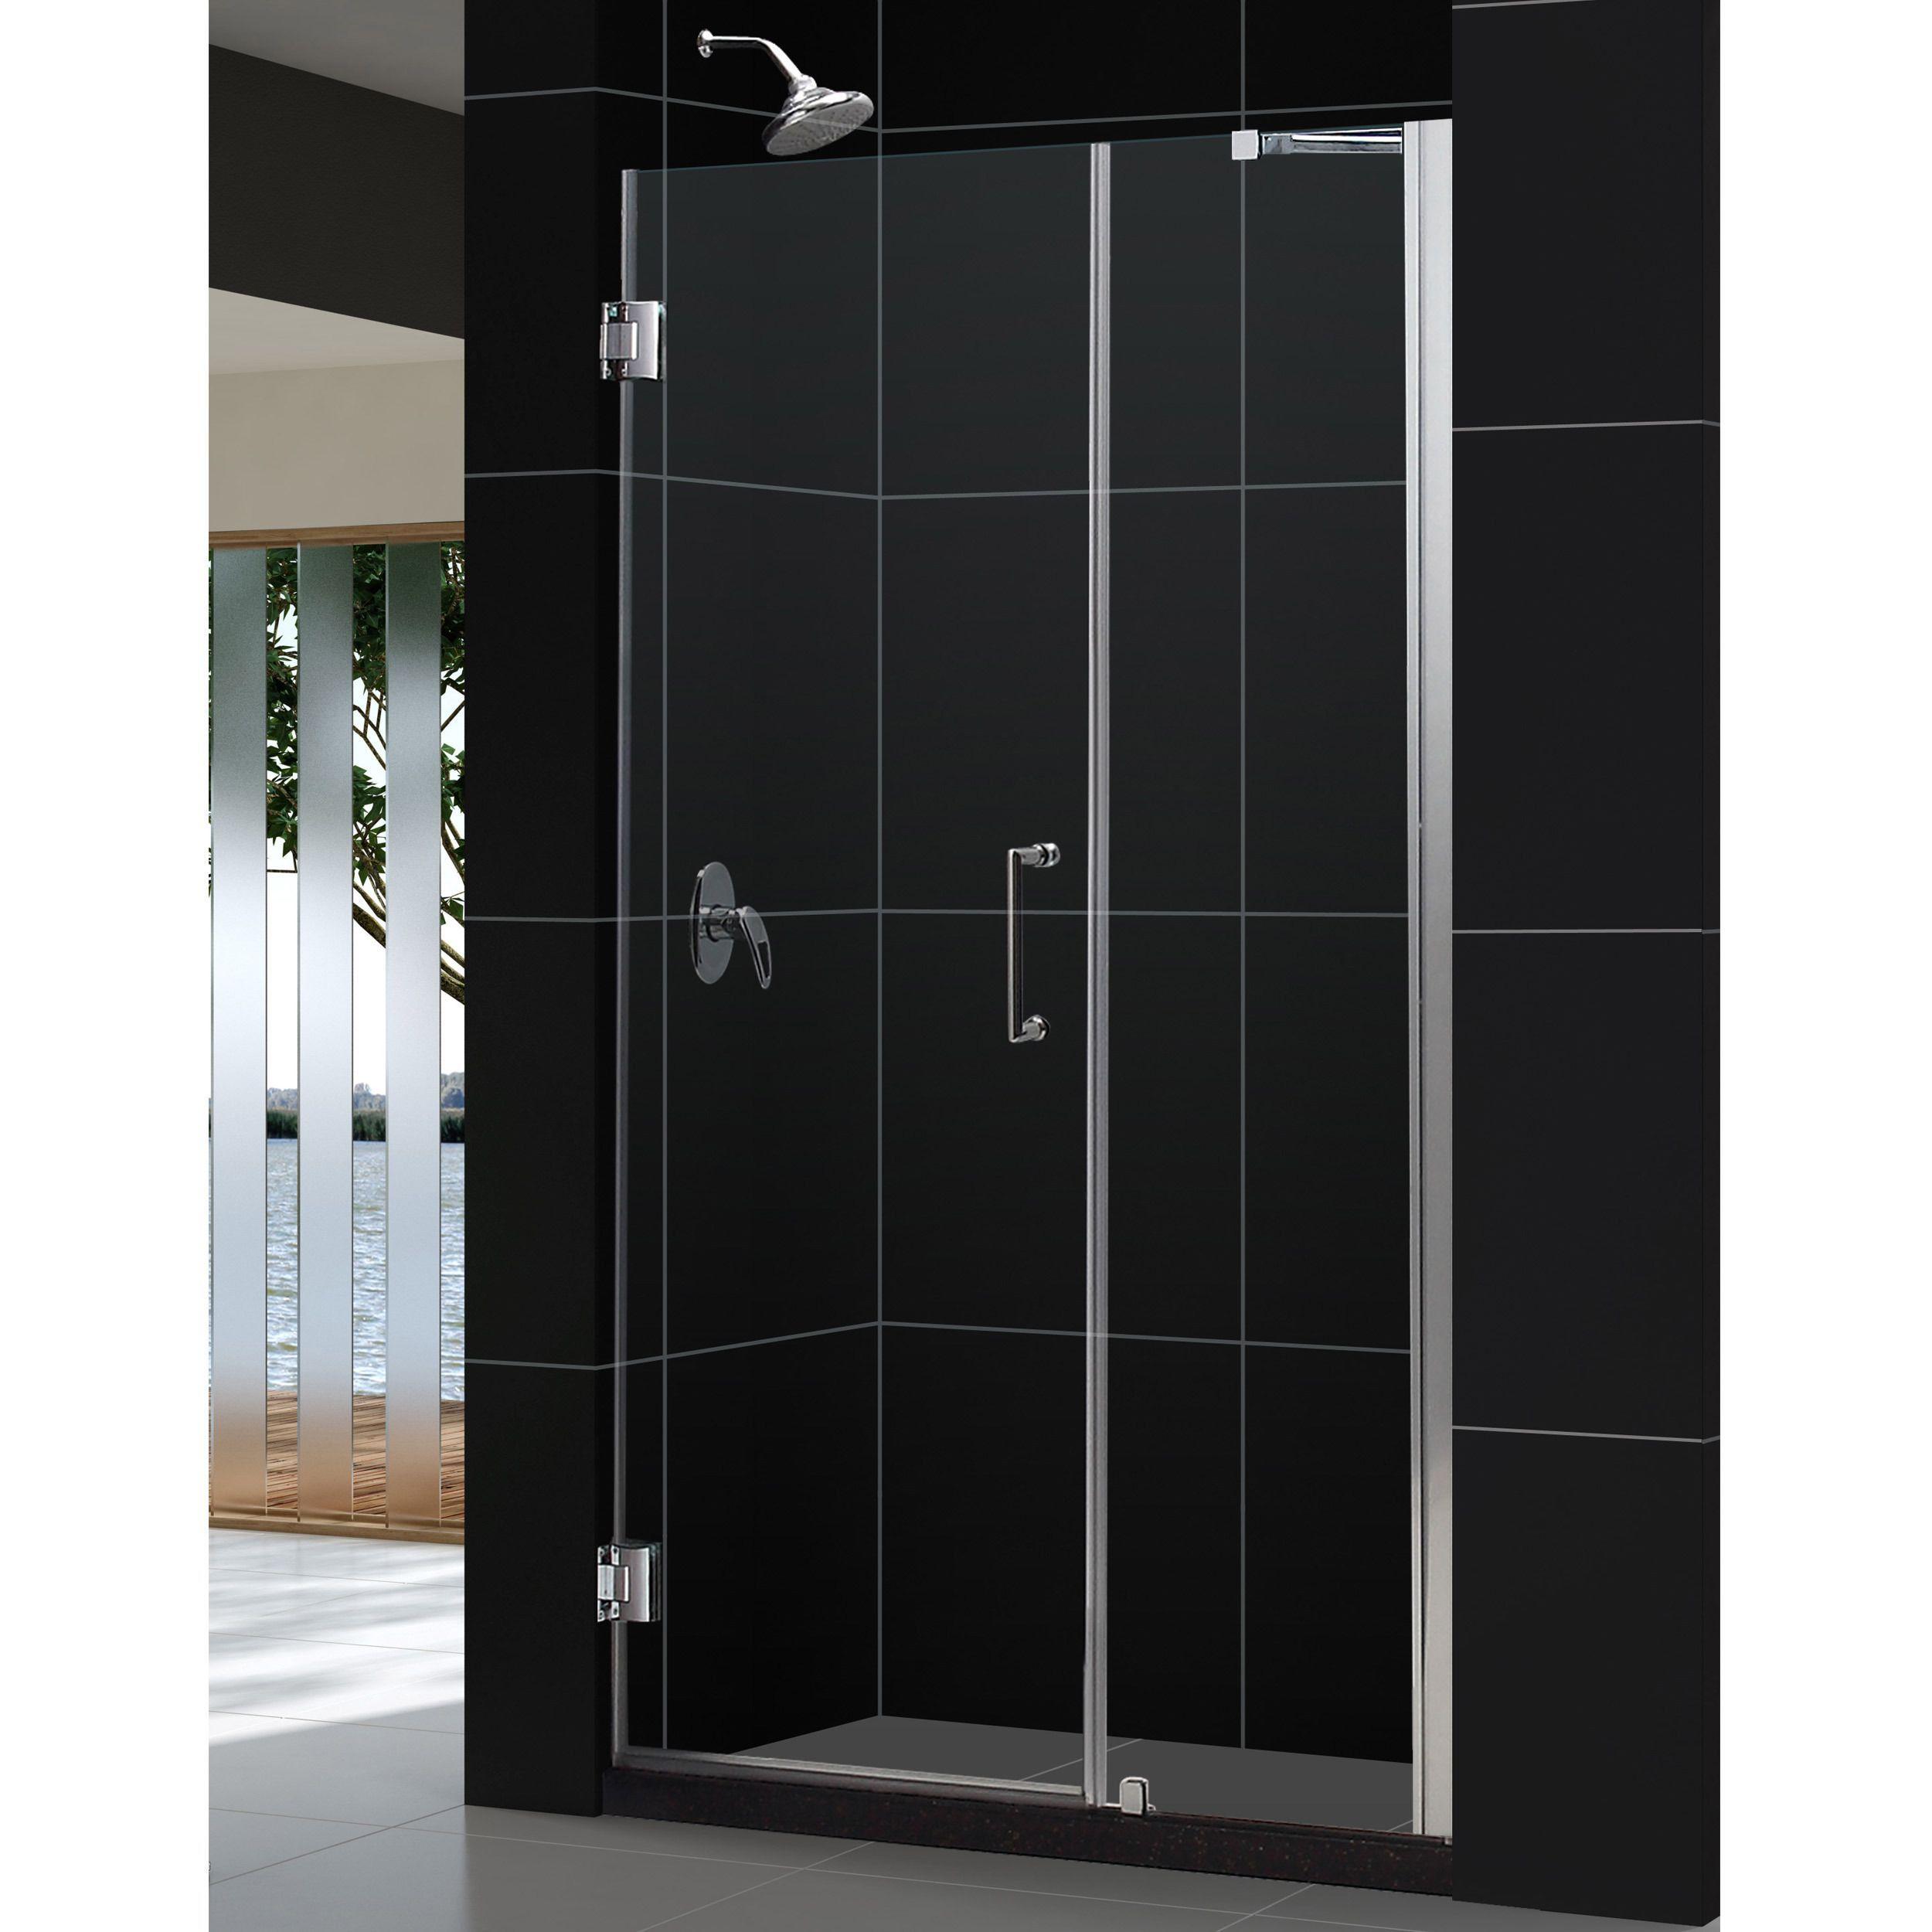 Dreamline Unidoor 41 42 In W X 72 In H Frameless Hinged Shower